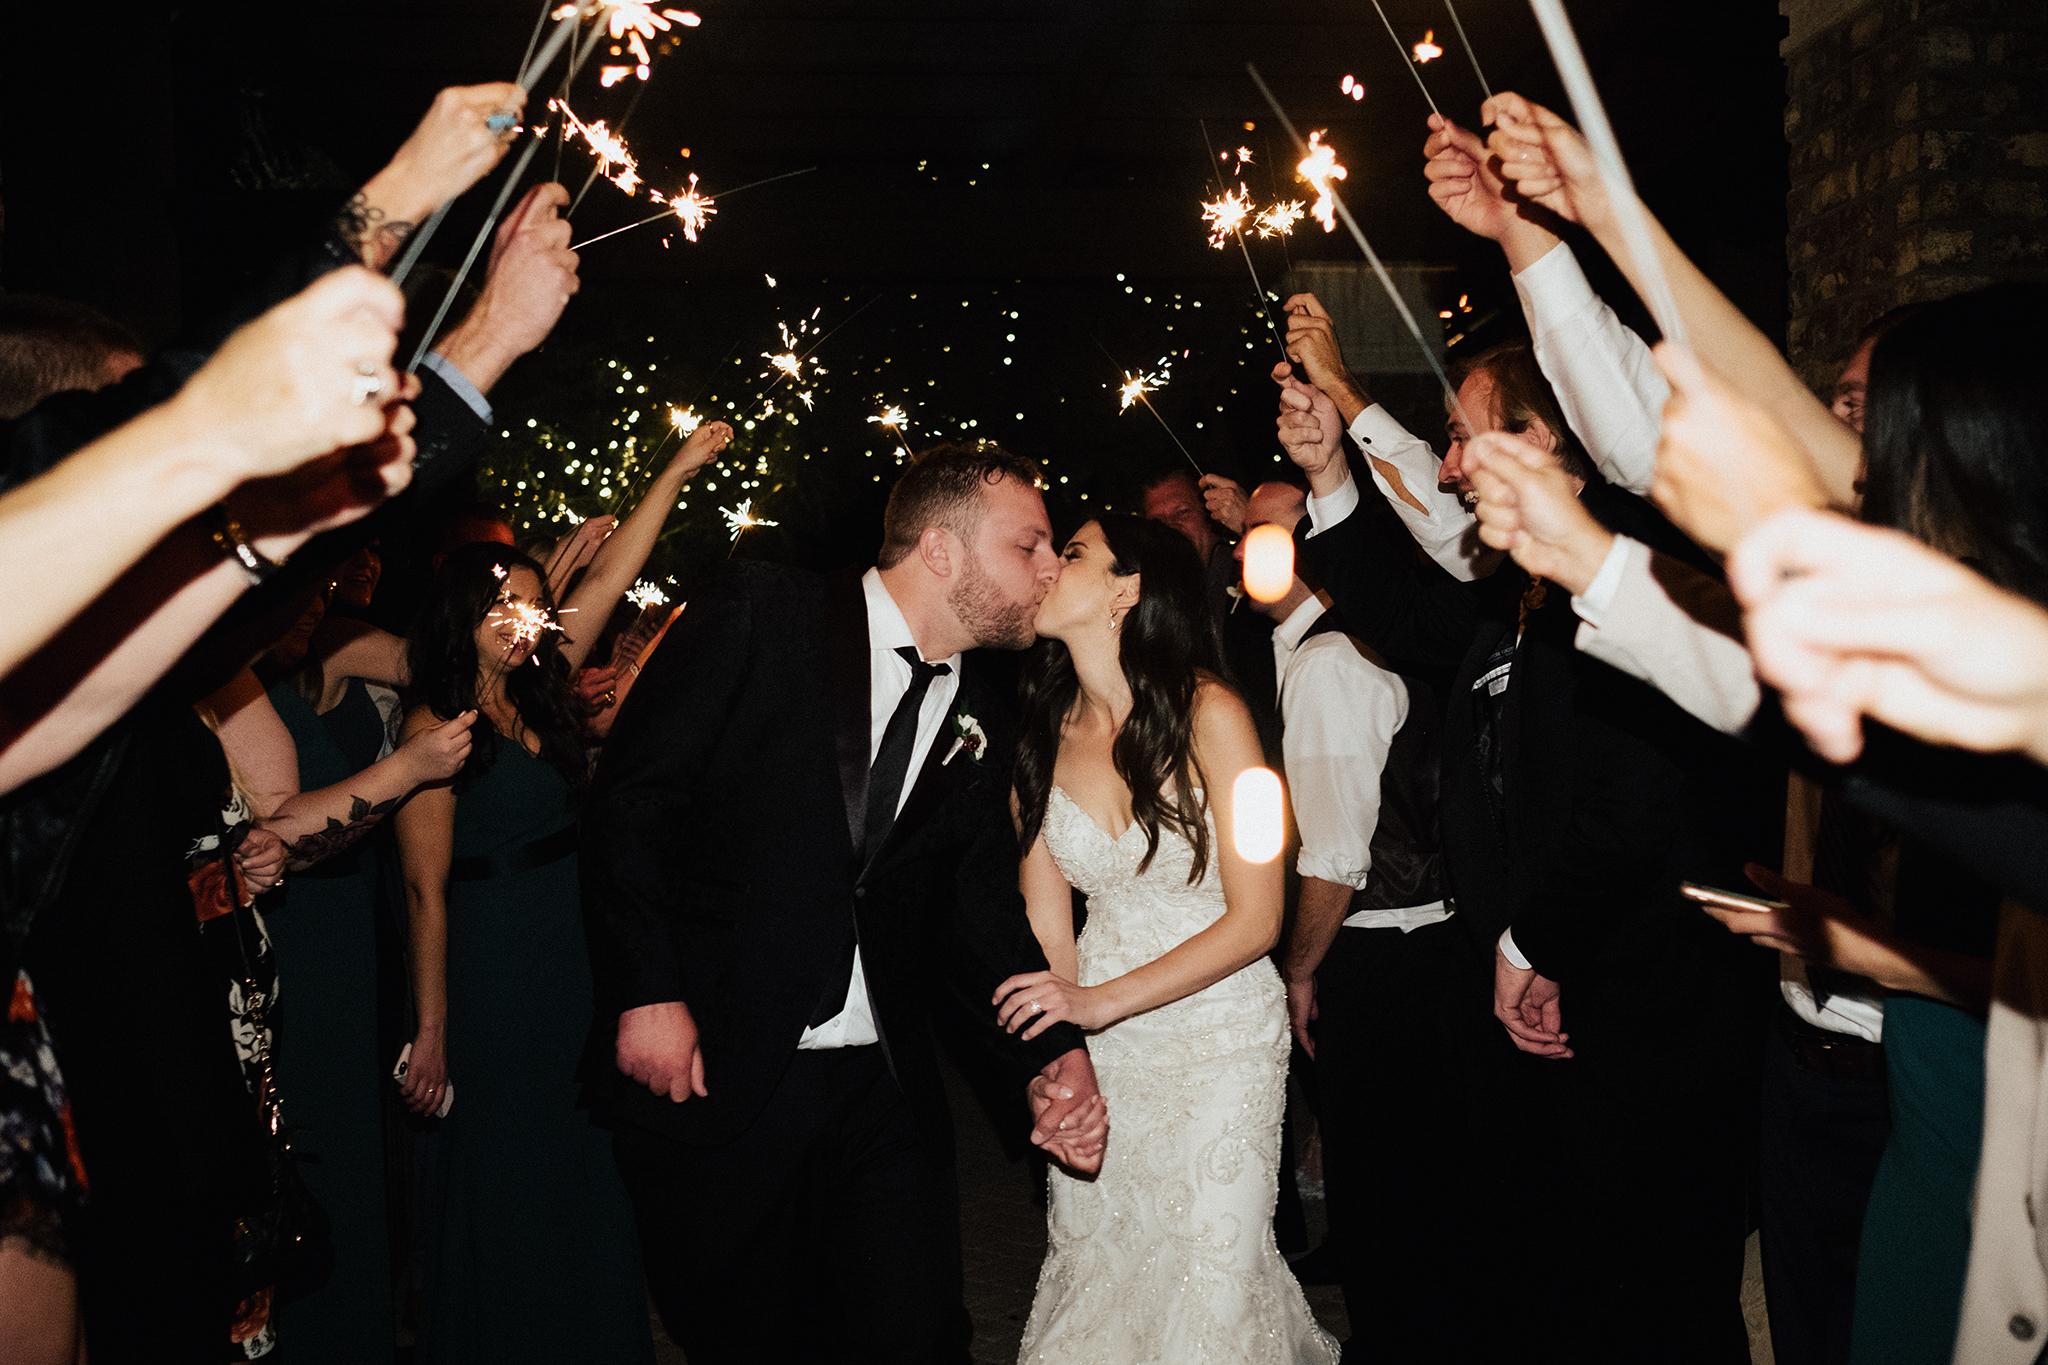 Arizona-Adventure-Elopement-Wedding-Photographer-103.jpg